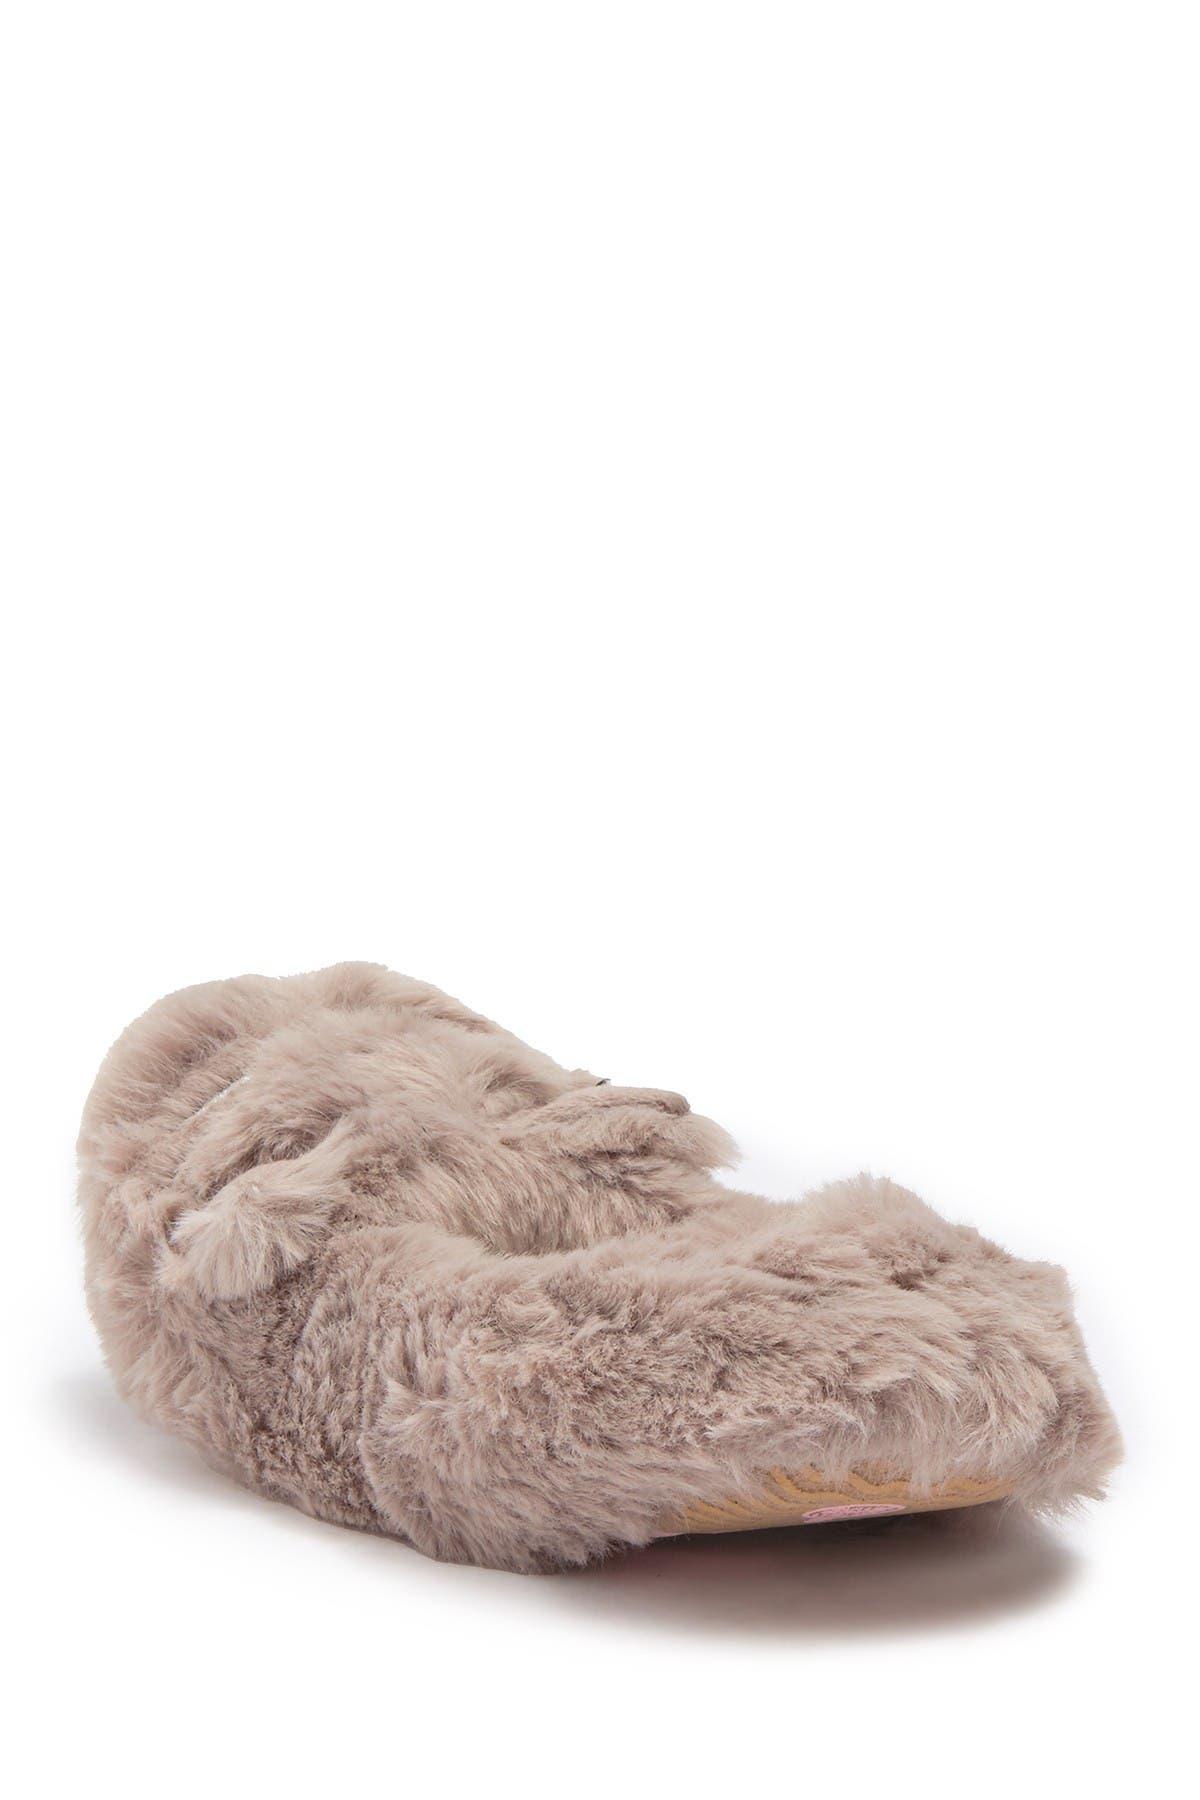 Joules Pippie Faux Fur Slipper